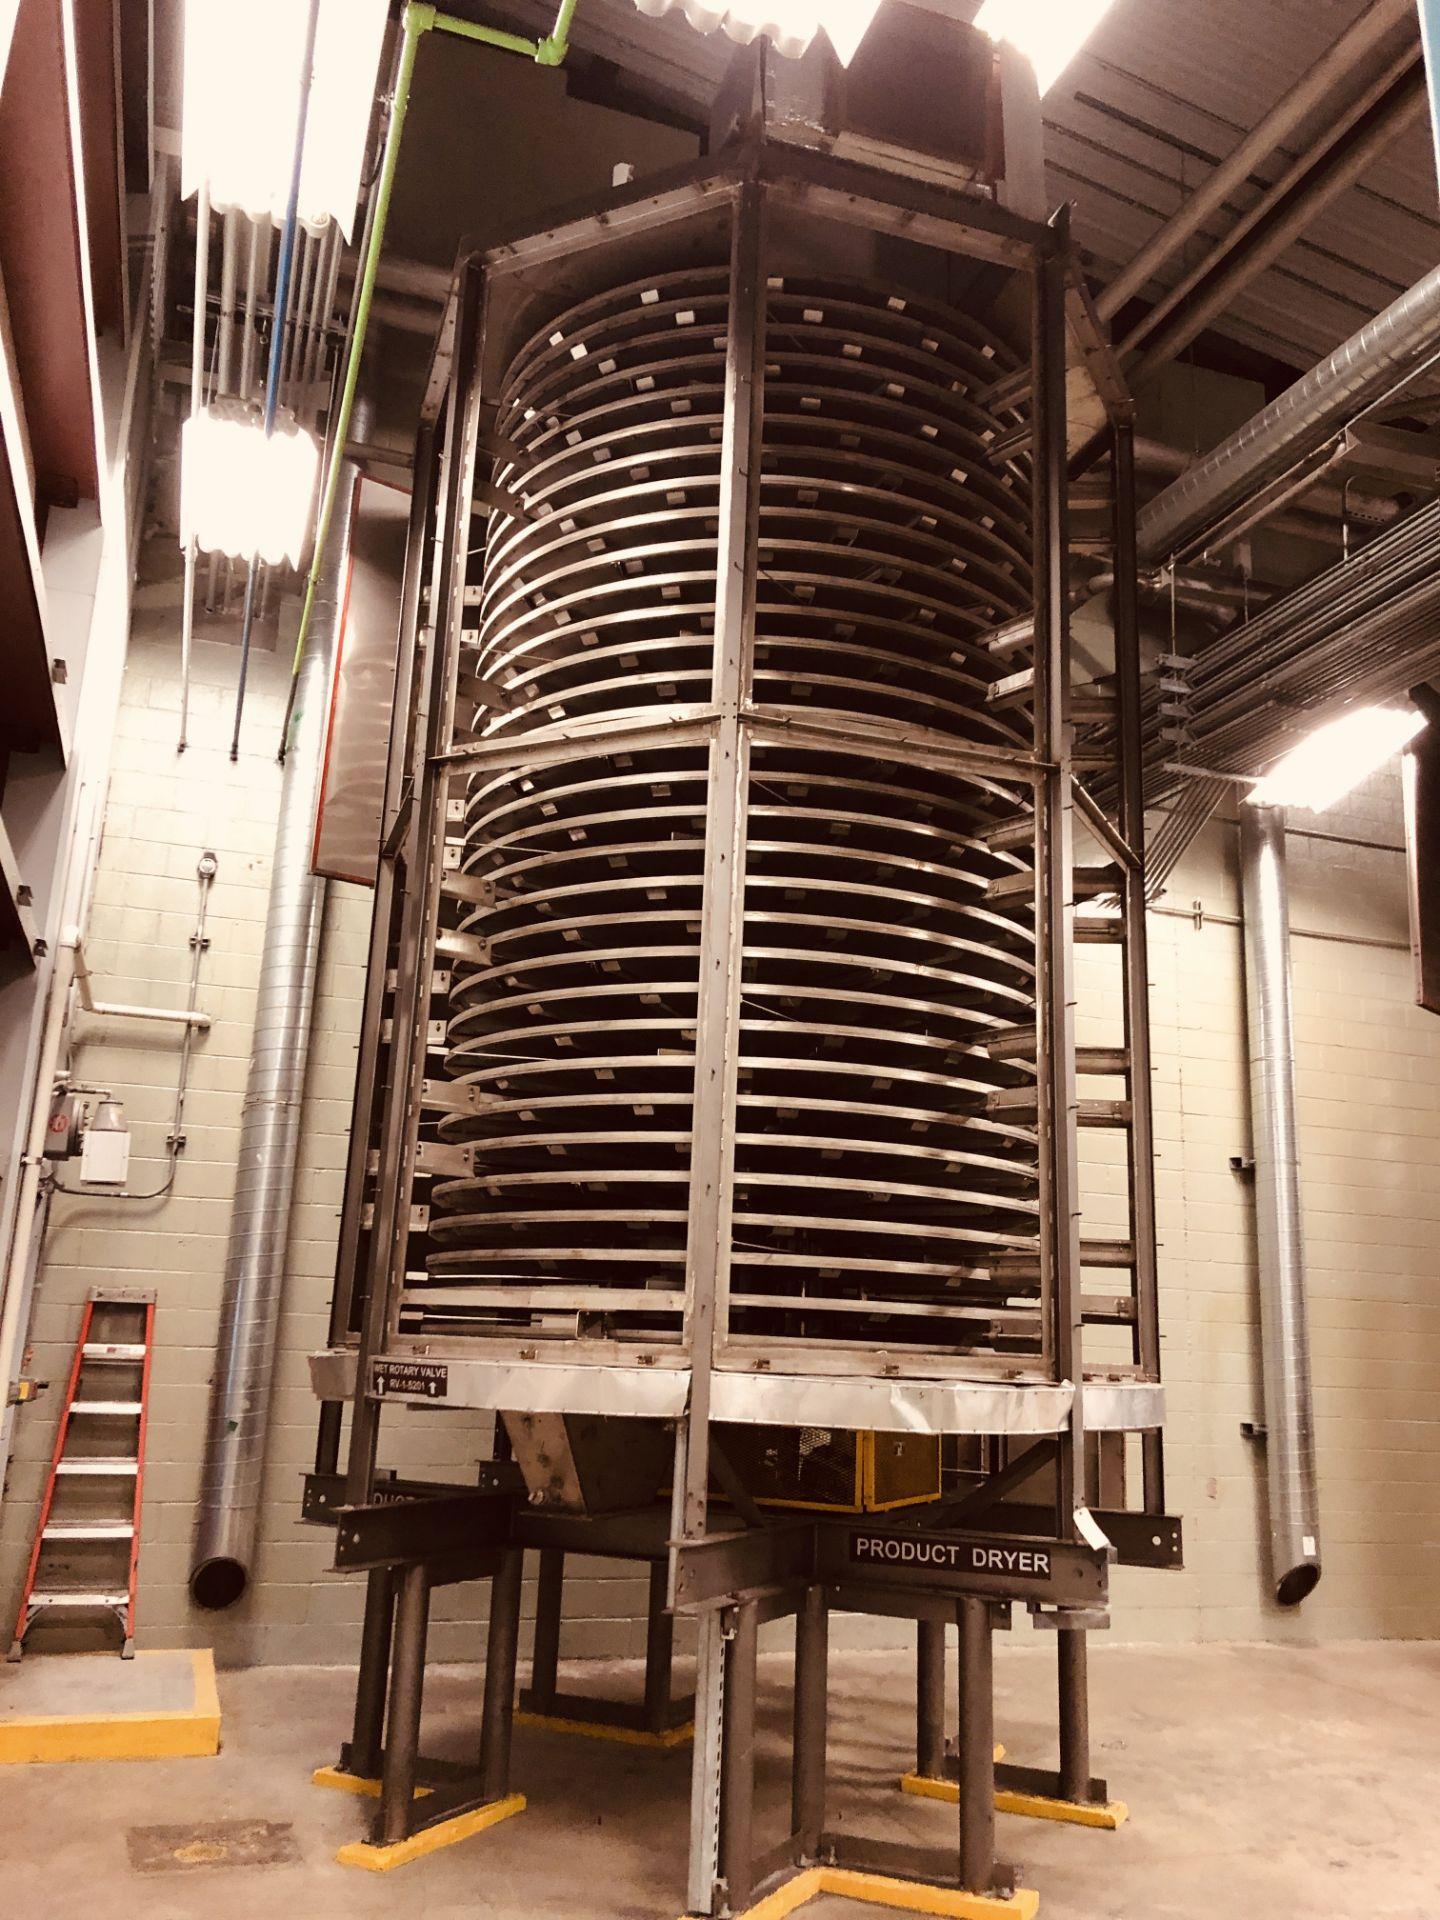 Wyssmont Model OE-32 Turbo Dryer - Includes Blower & Rotary Air Locks - Image 5 of 6